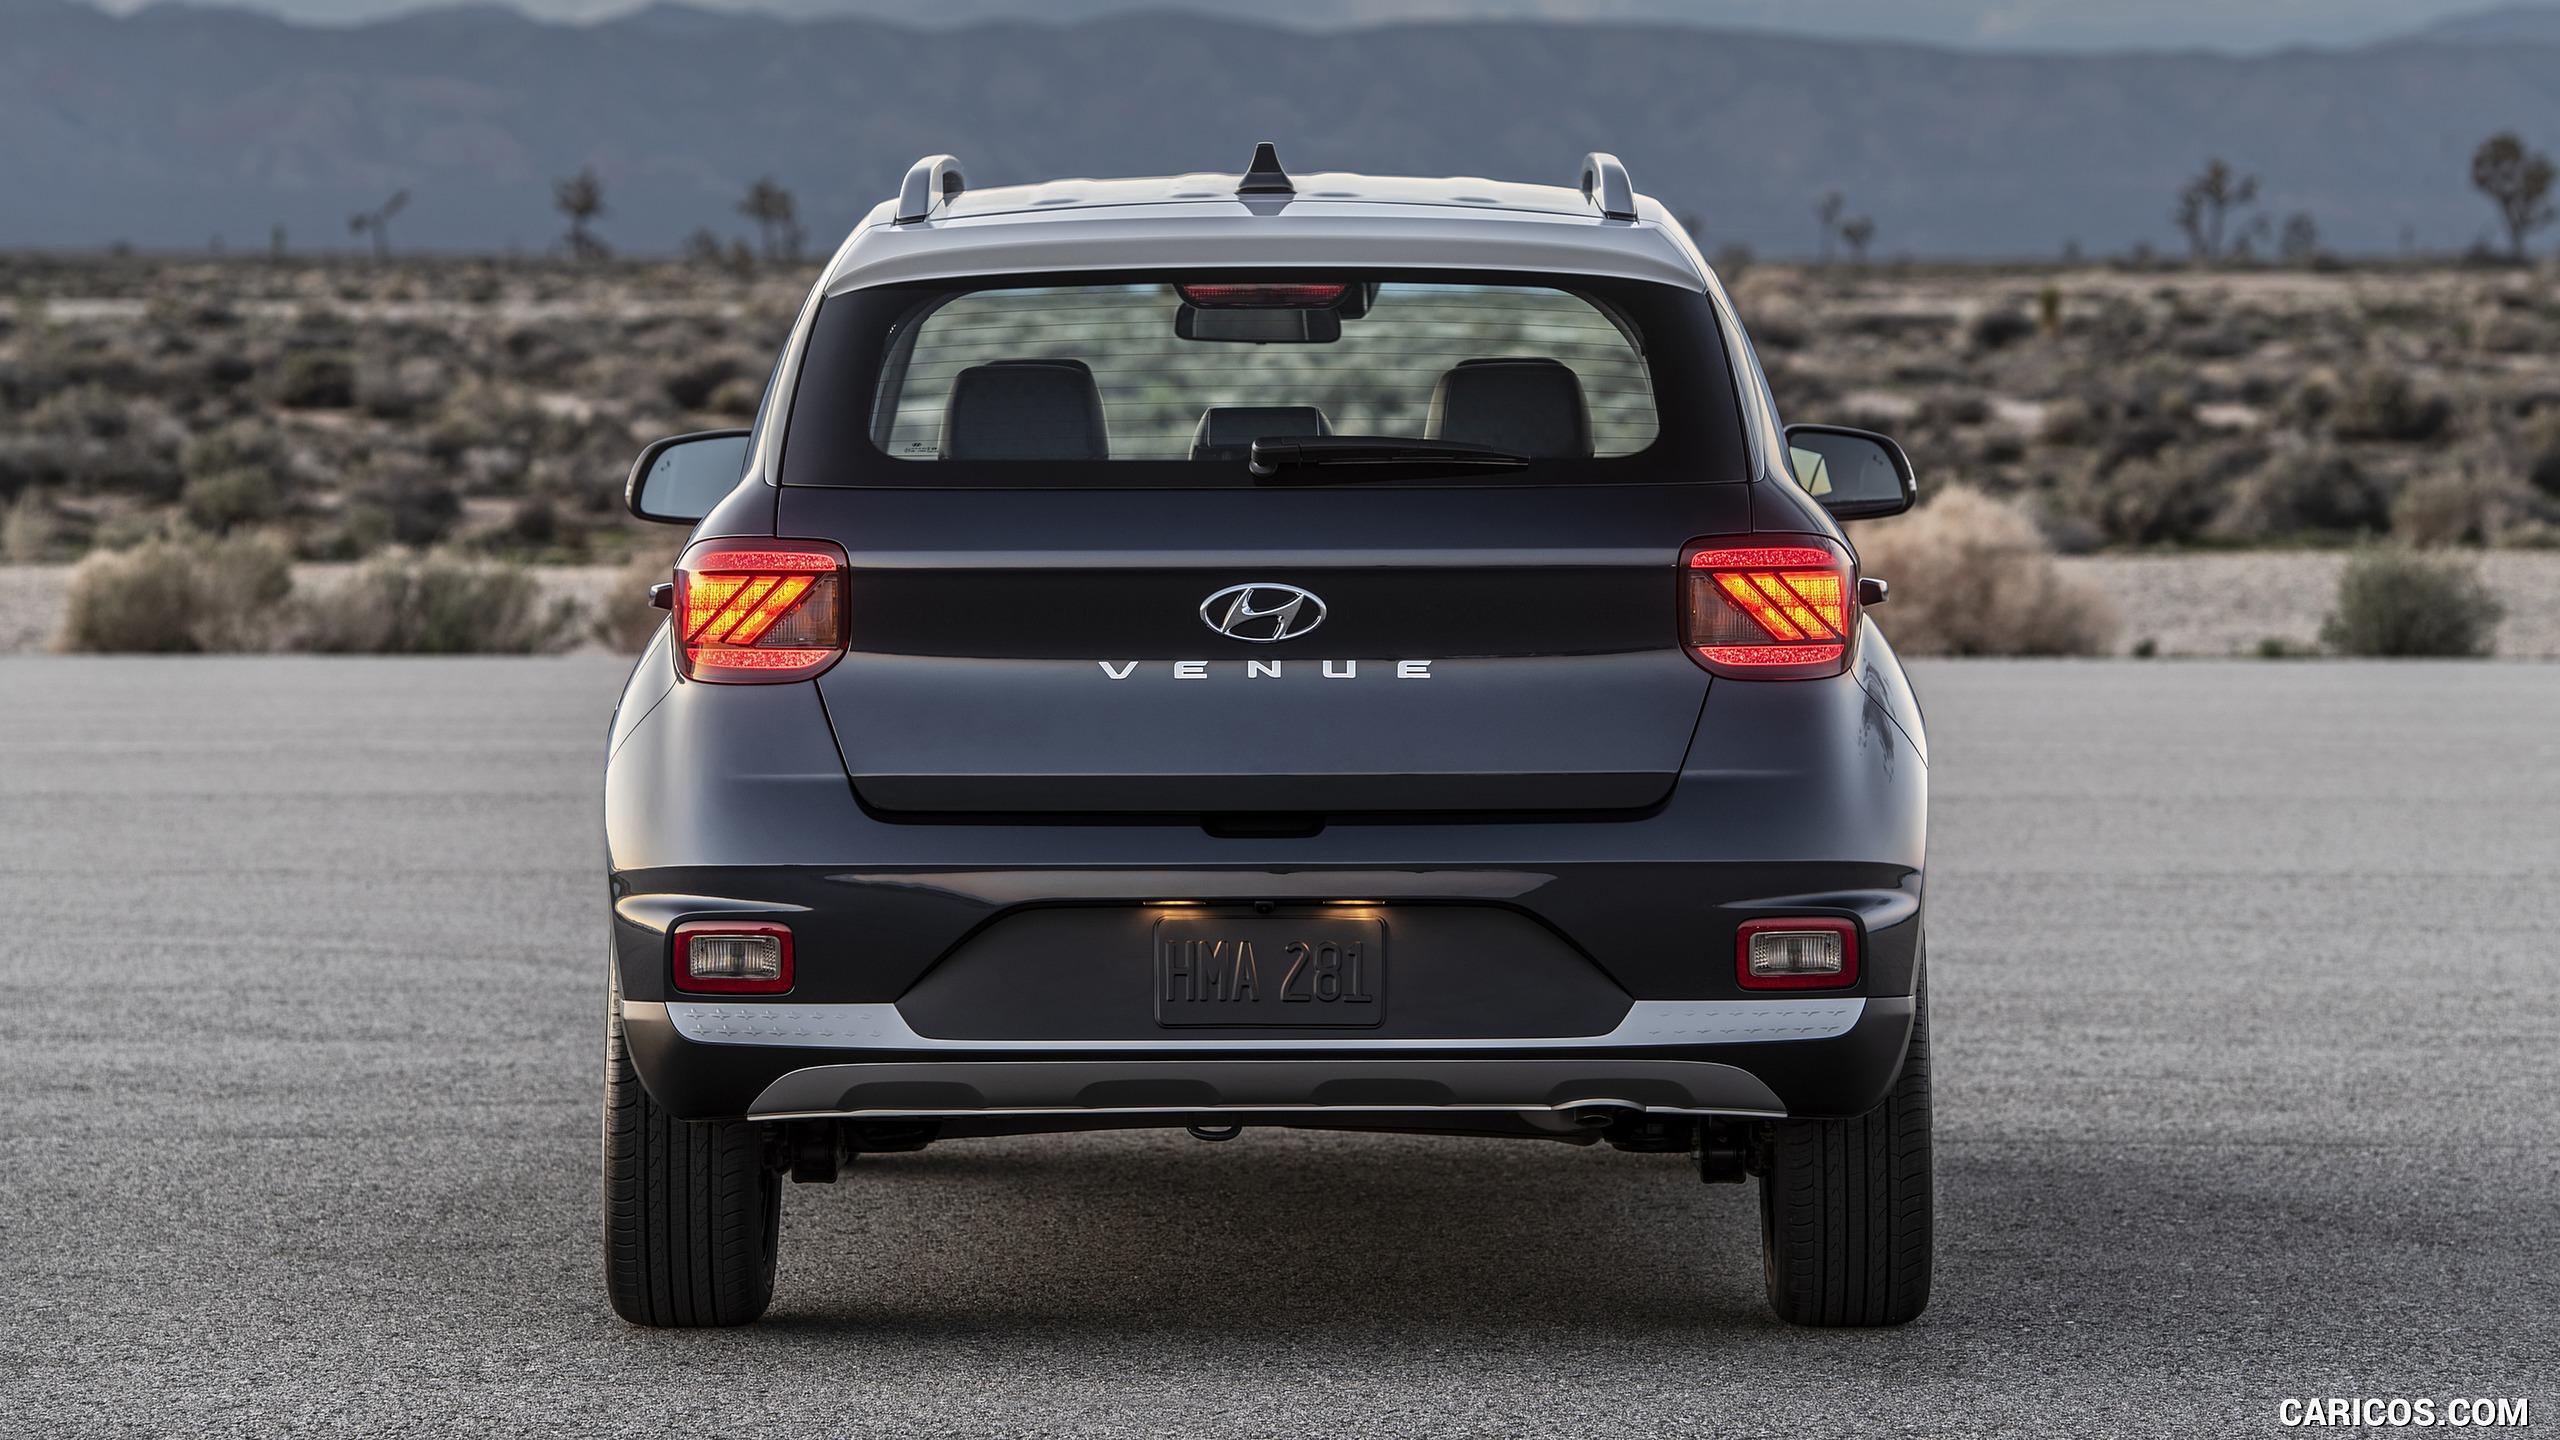 2020 Hyundai Venue   Rear HD Wallpaper 13 2560x1440